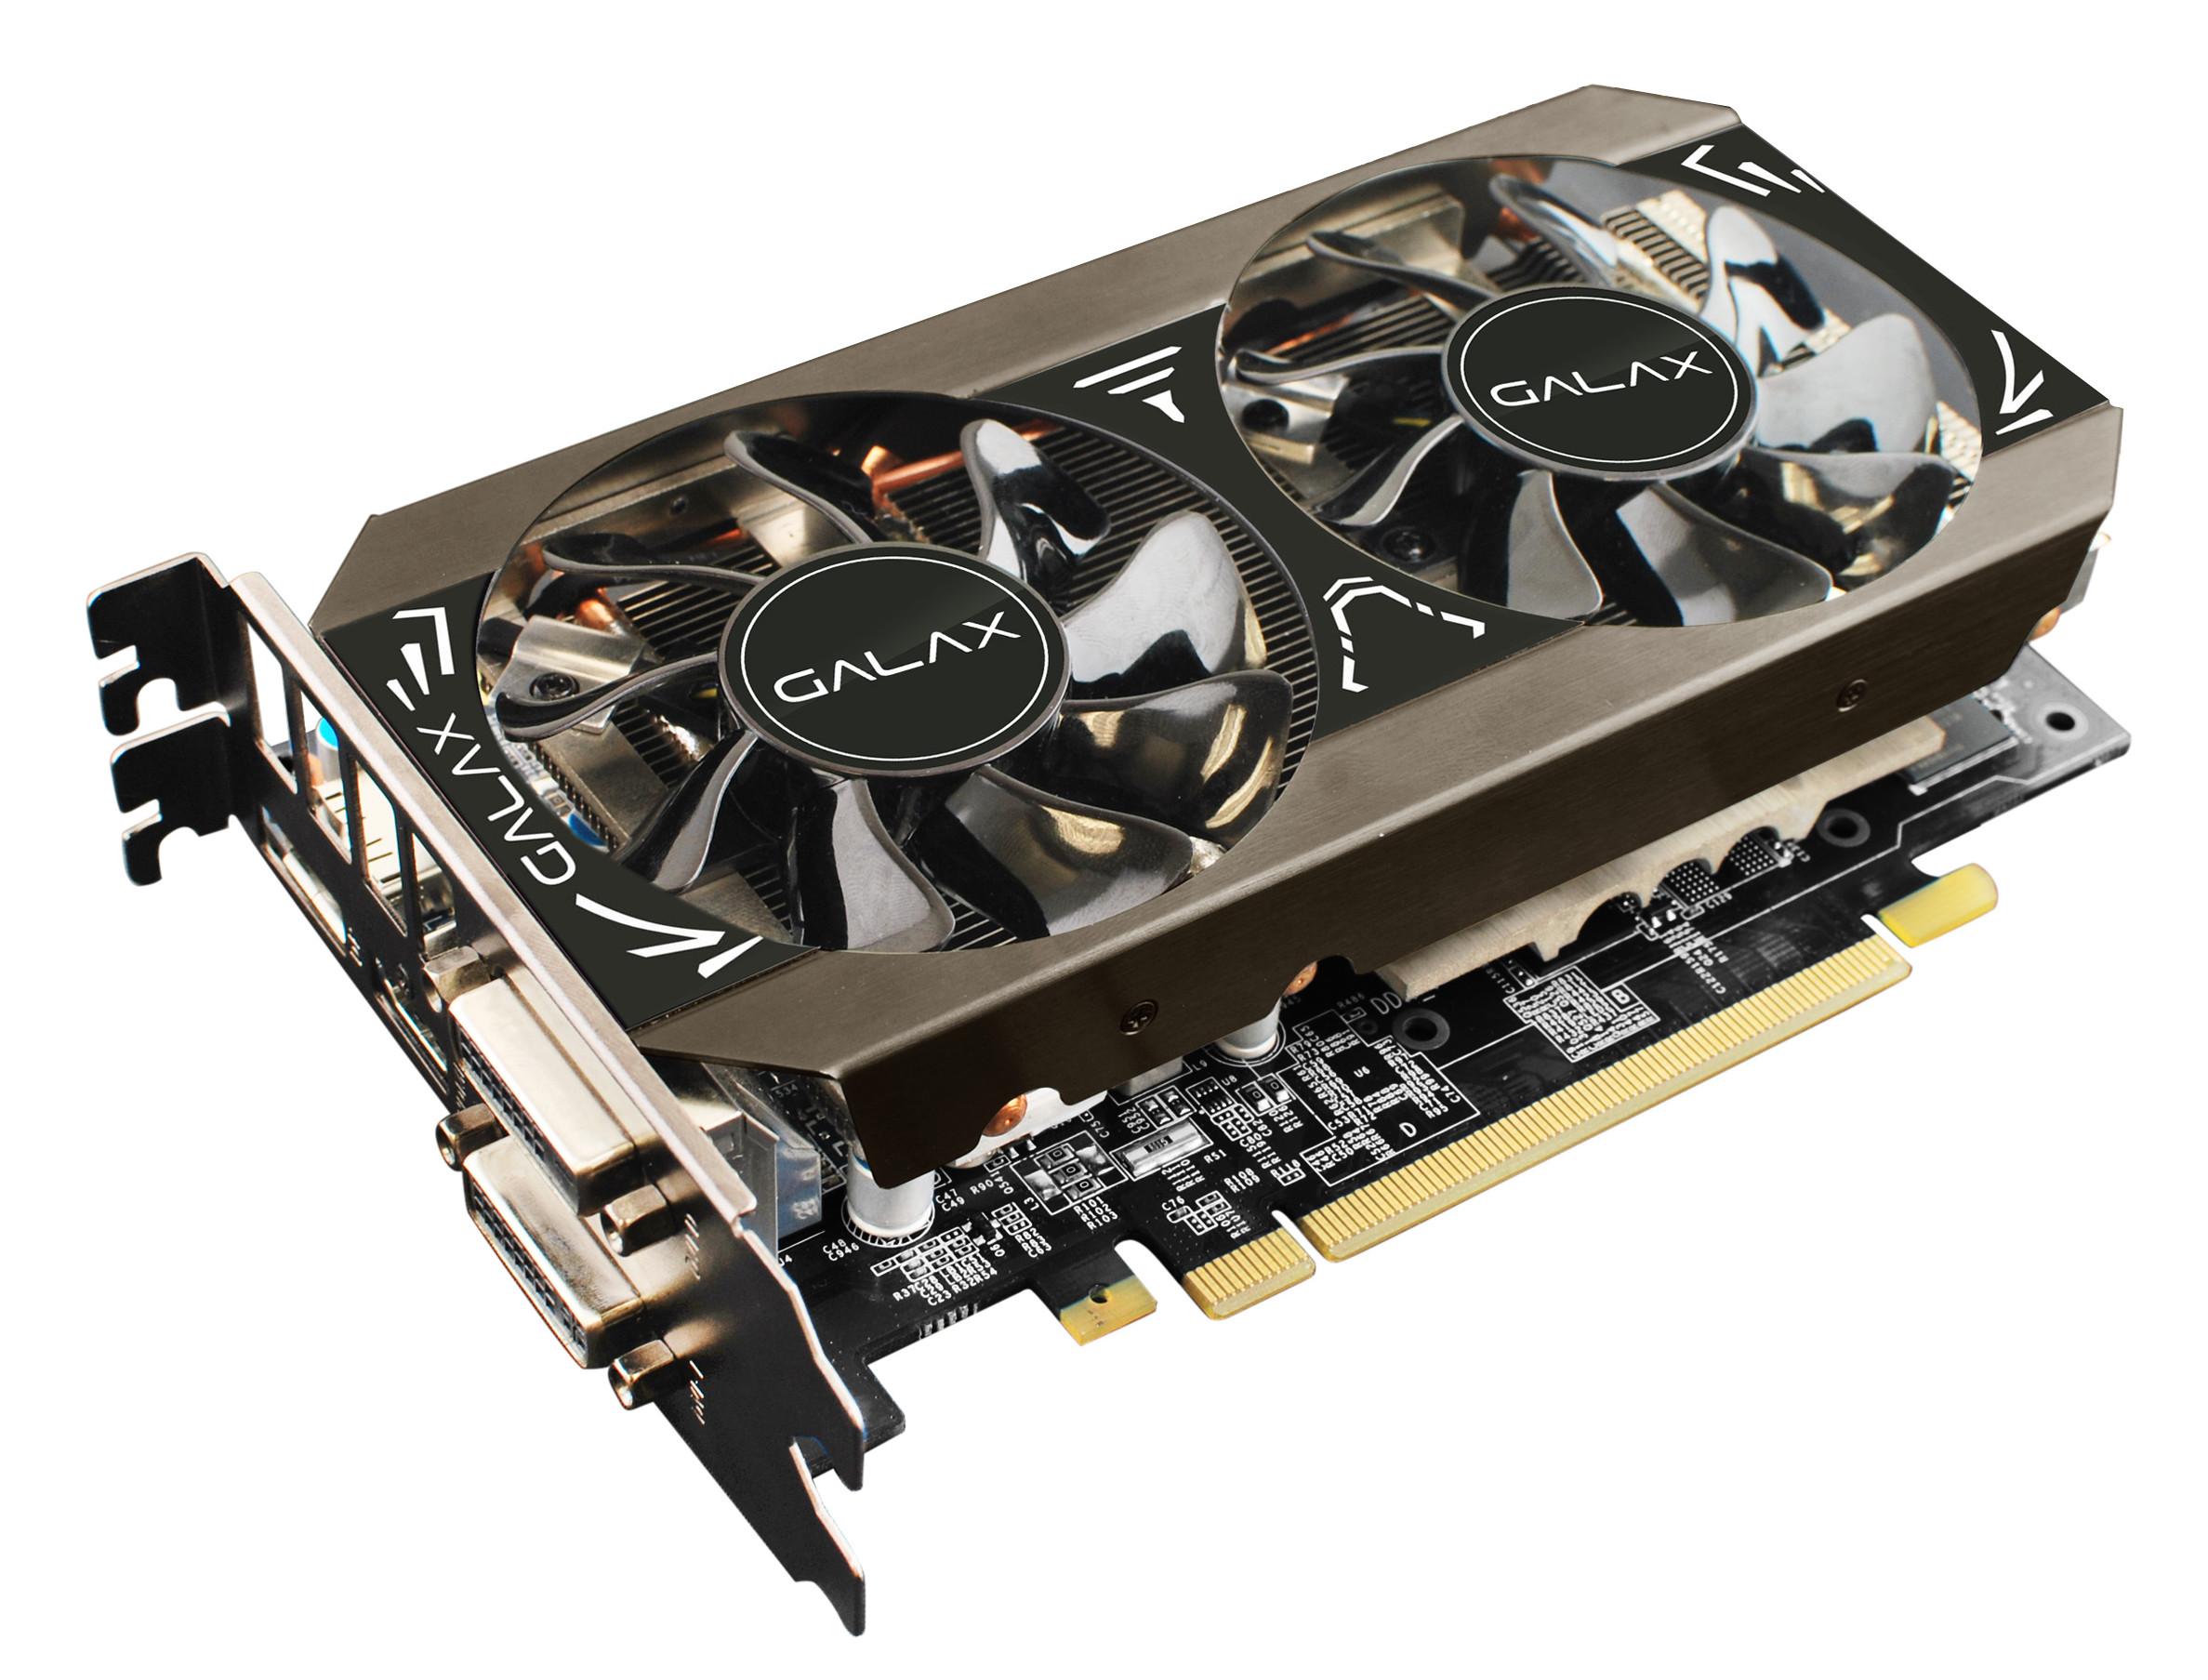 Galax annonce une GeForce GTX 970 Black Edition